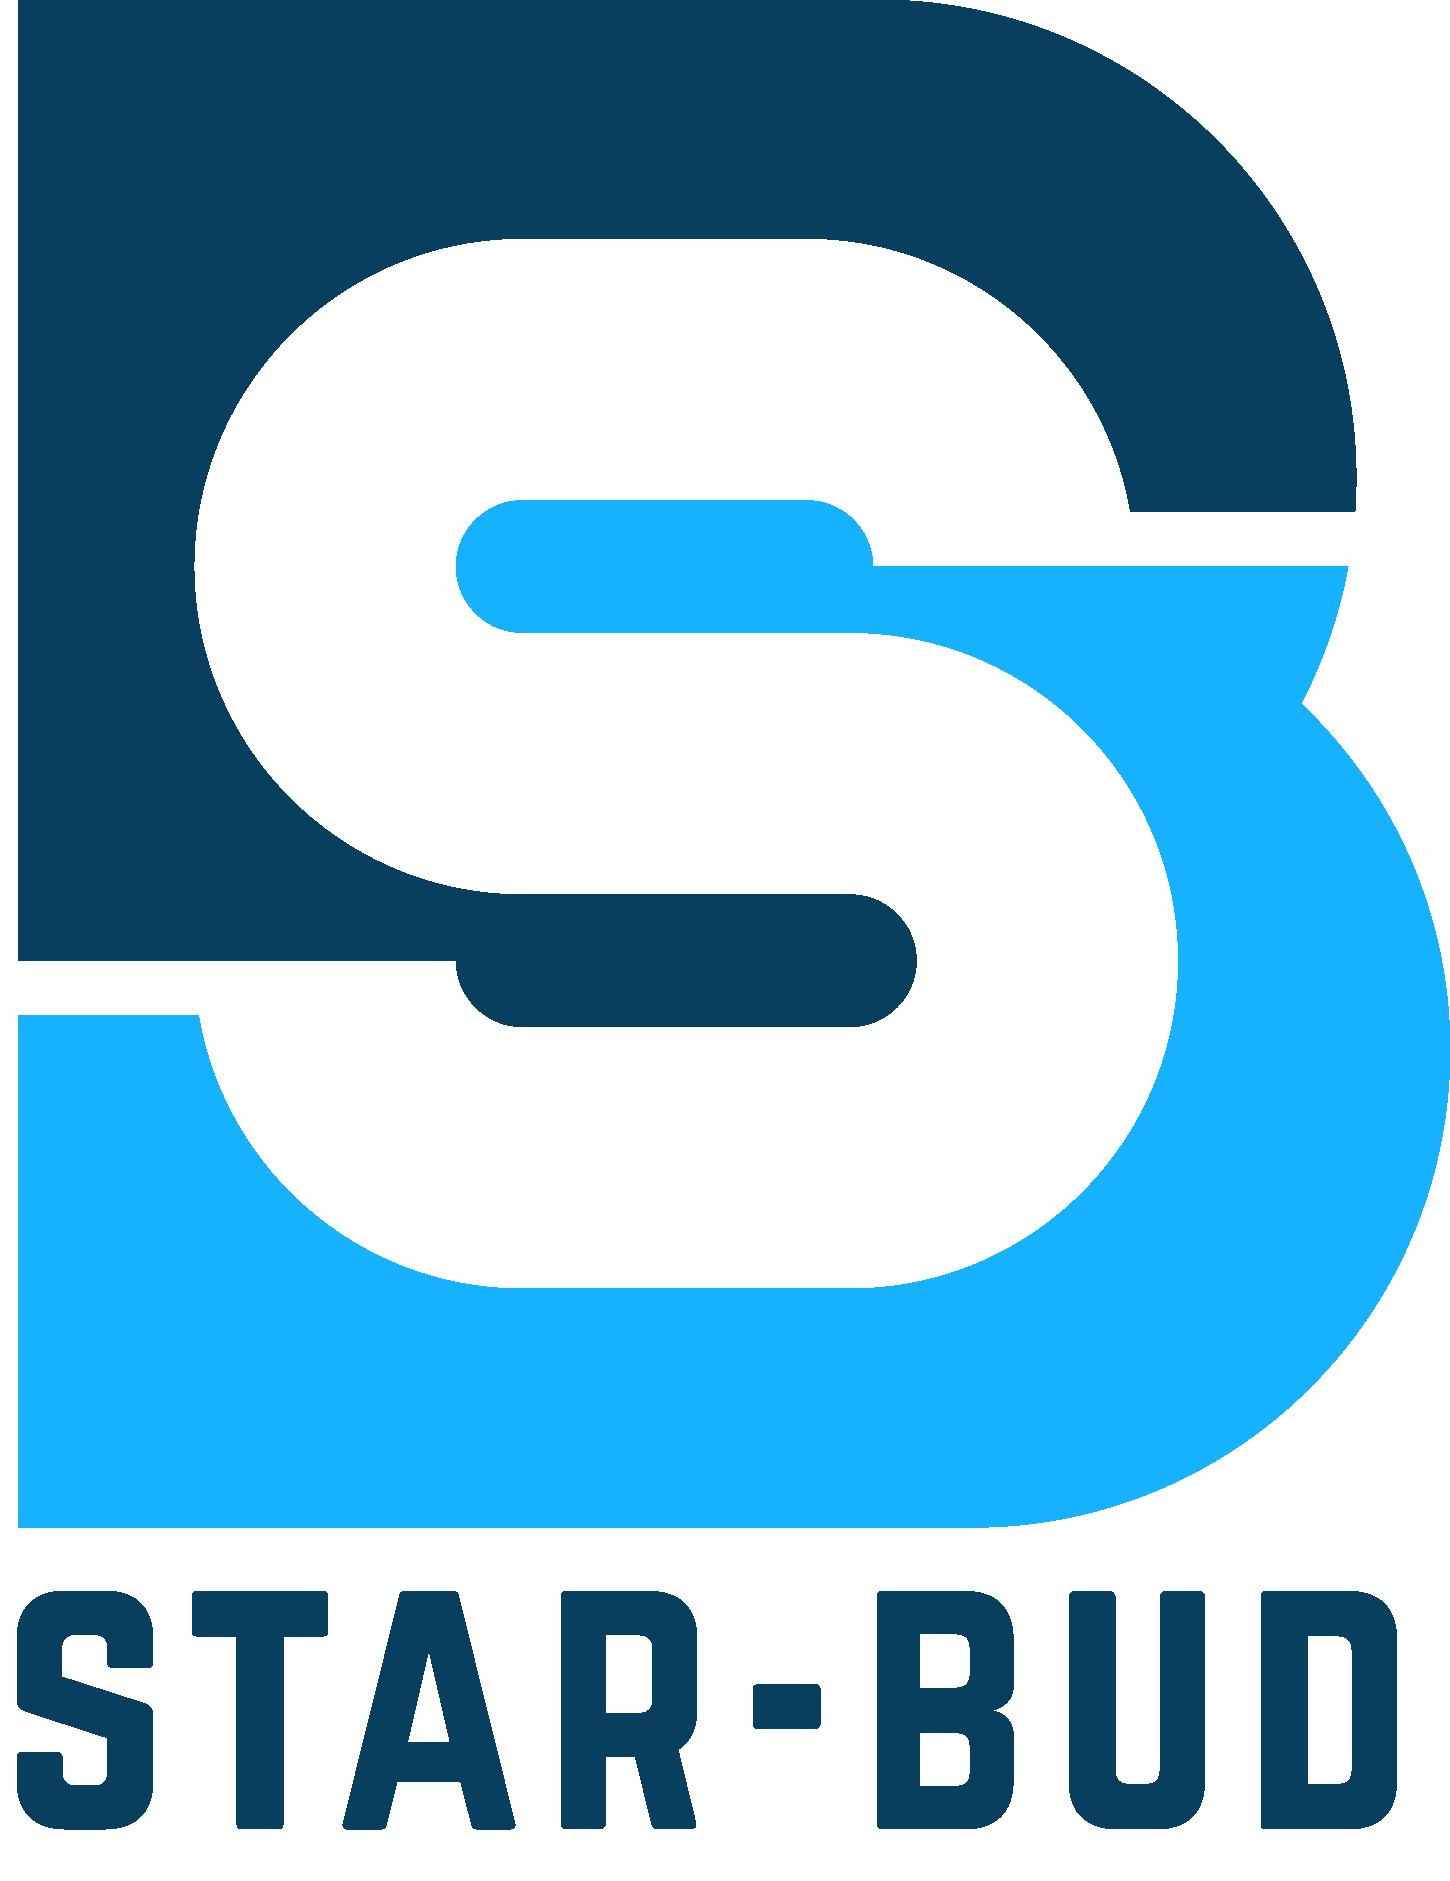 STAR-BUD